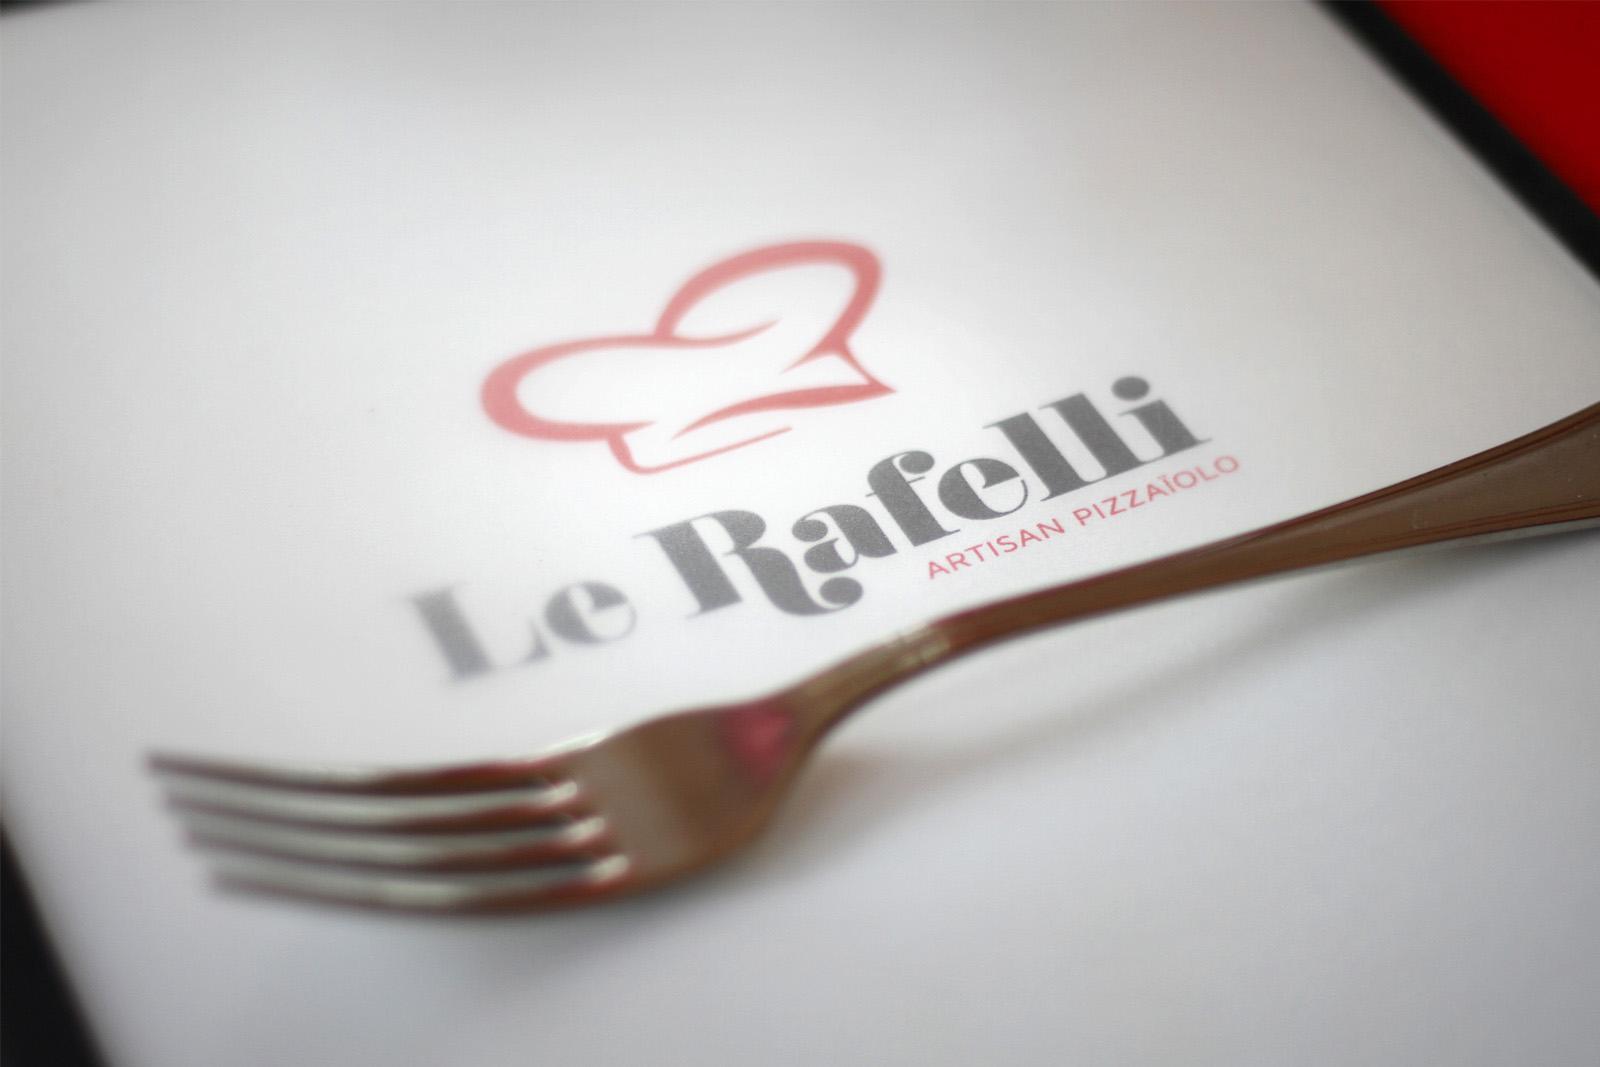 le-rafelli-pizzeria-restaurant-logo-menu